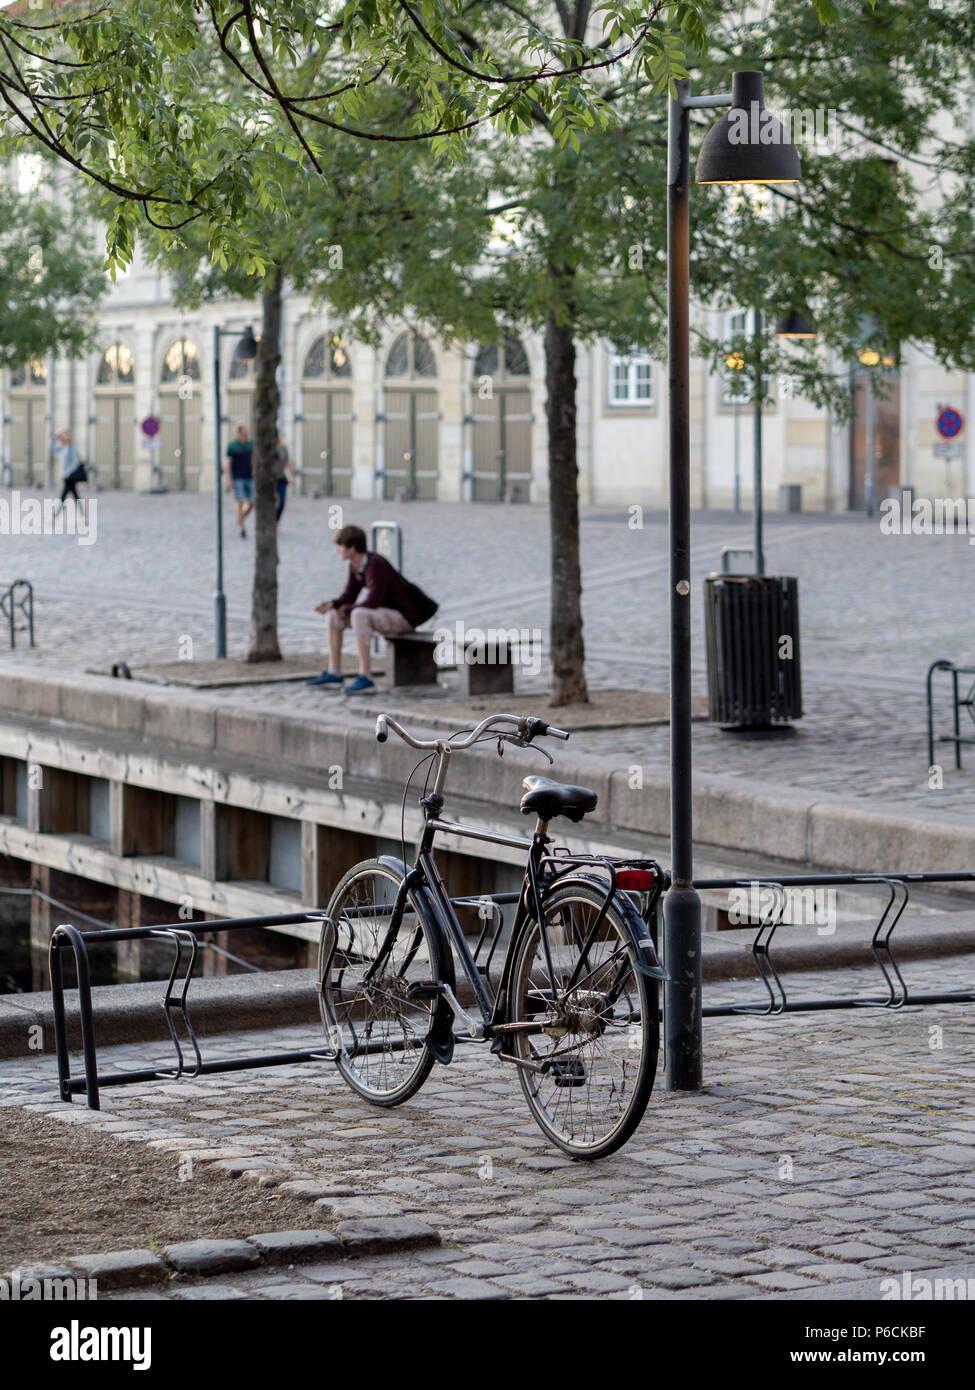 Copenhagen - Street with bike - Stock Image